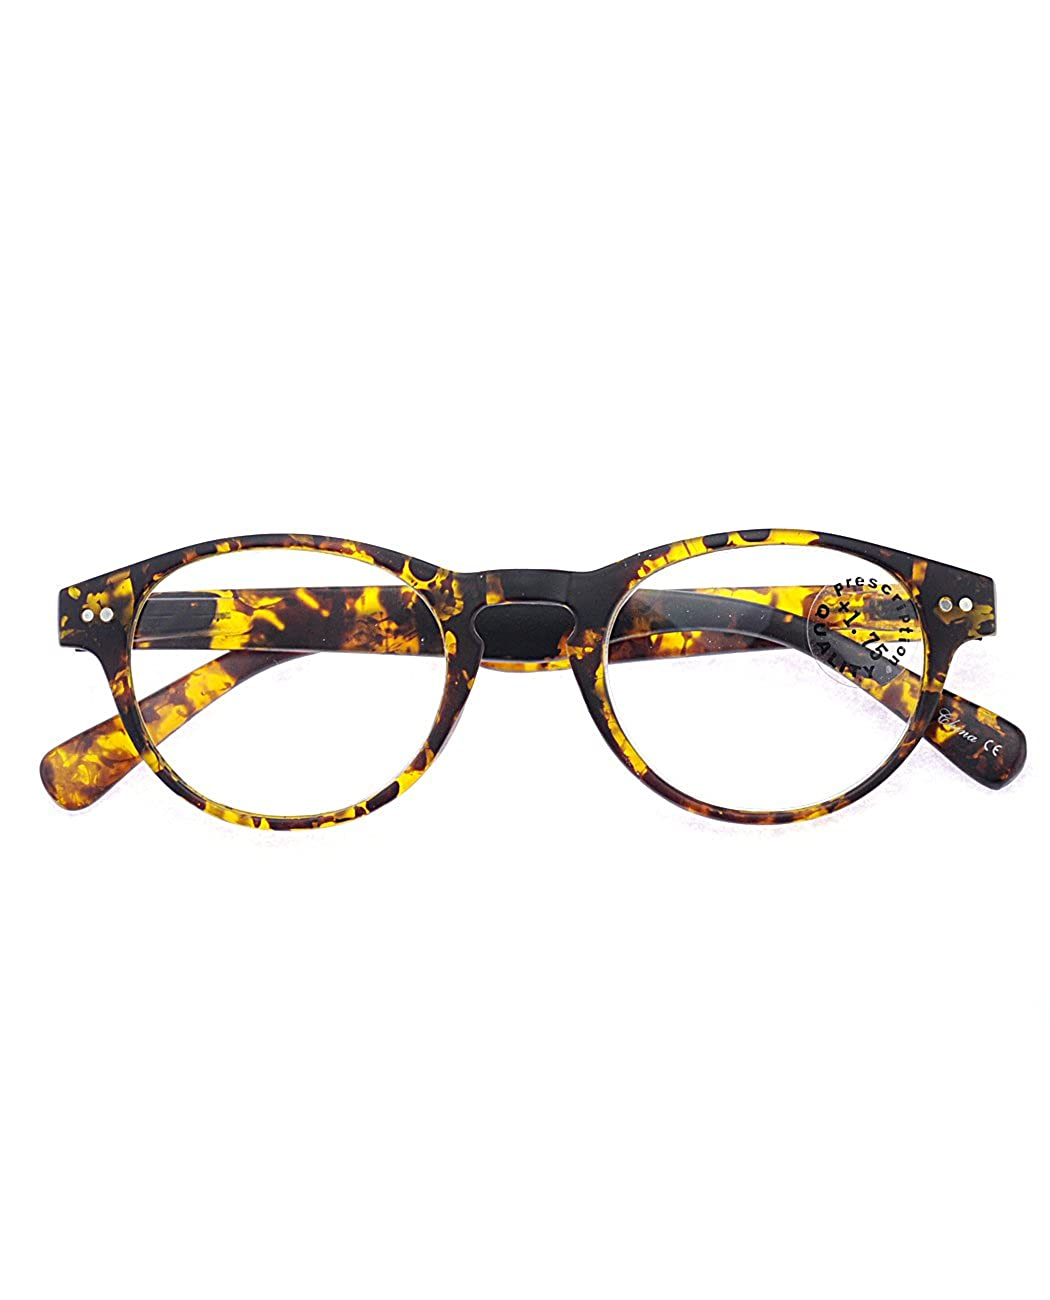 99c2b8d67624 Amazon.com  NYFASHION101 Unisex Casual Lightweight Modern Round Frame  Reading Glasses